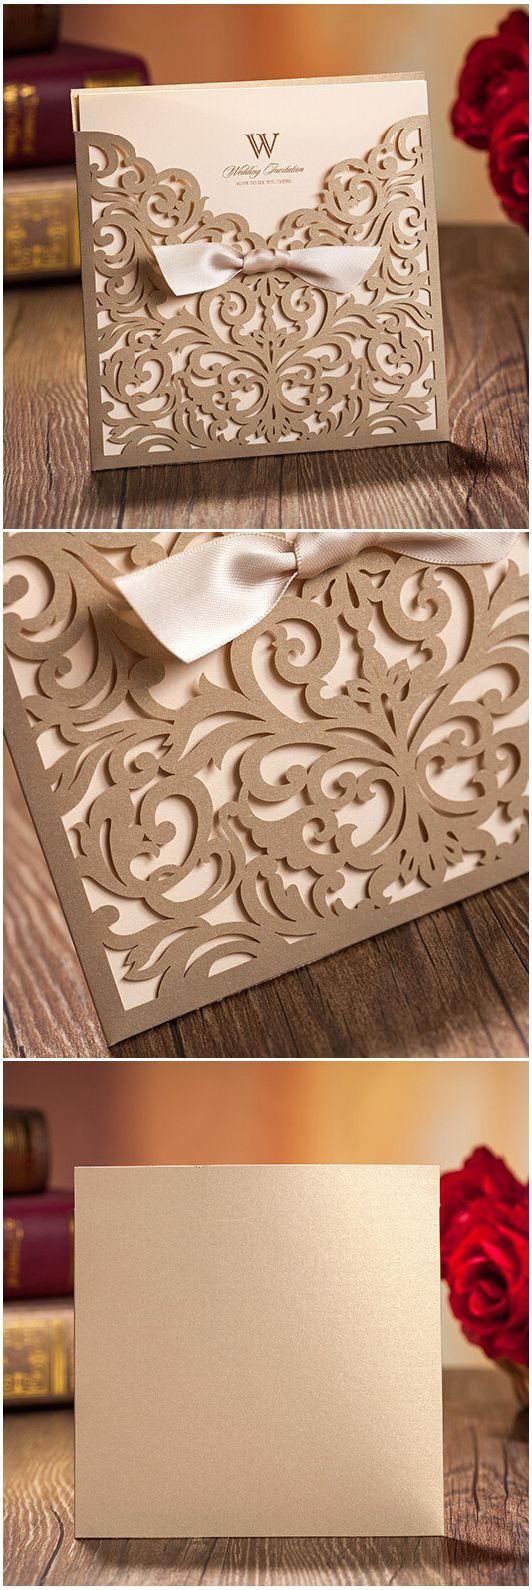 Elegant Metallic Gold Laser Cut Pocket Wedding Invitations with Free RSVP Cards @elegantwinvites